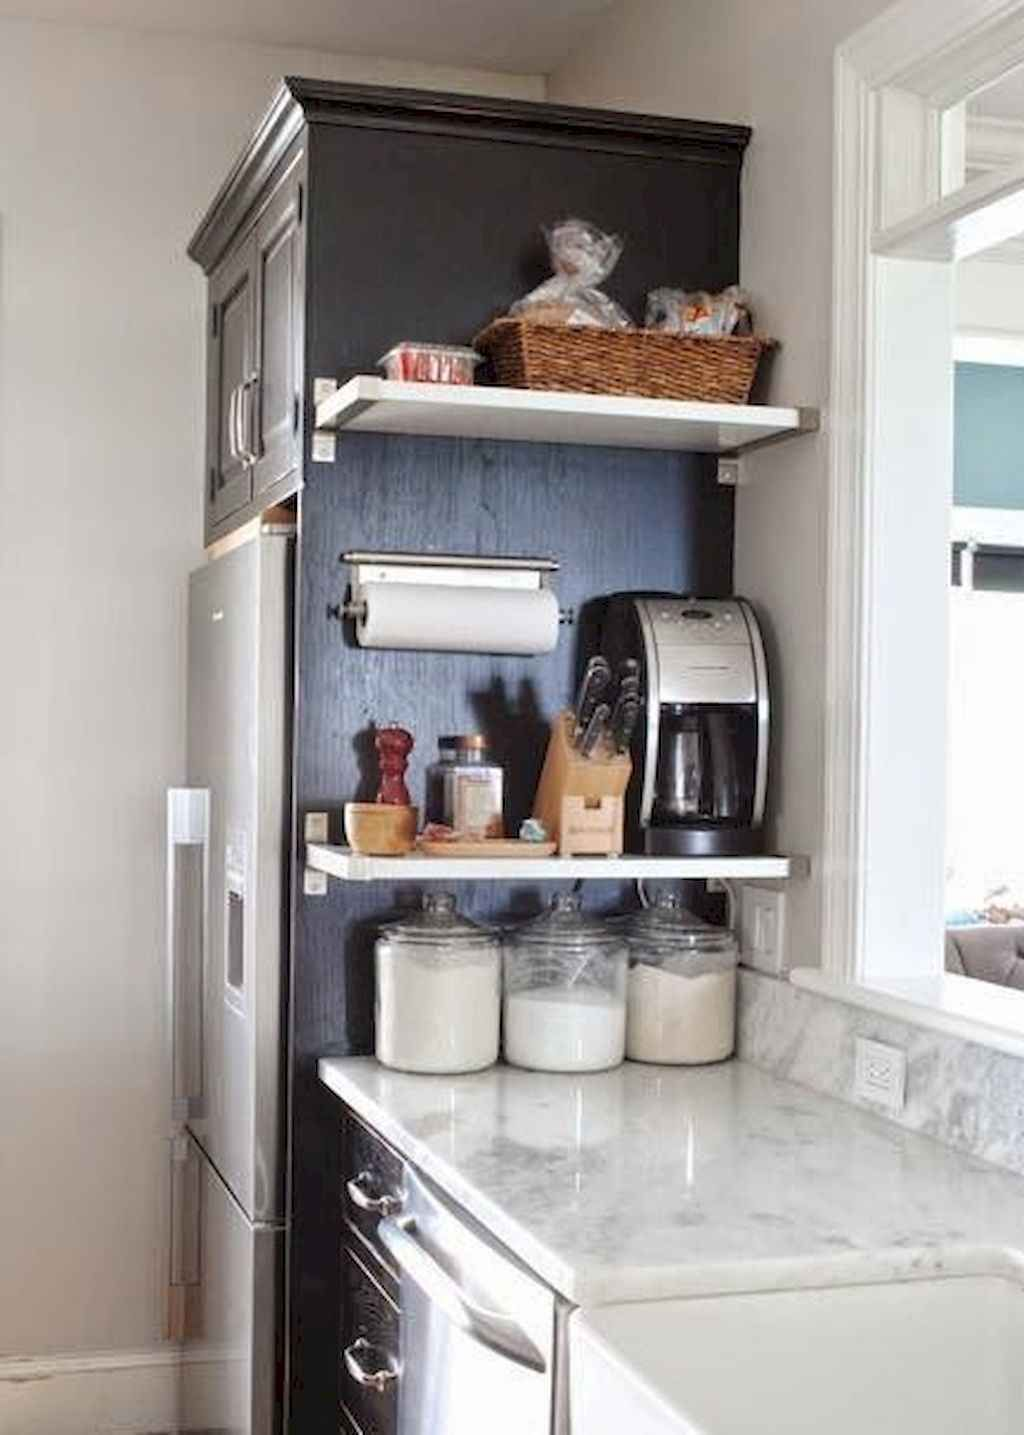 55 Diy Small Kitchen Storage And Organization Ideas Gladecor Com Small Apartment Kitchen Decor Small Apartment Kitchen Kitchen Diy Makeover